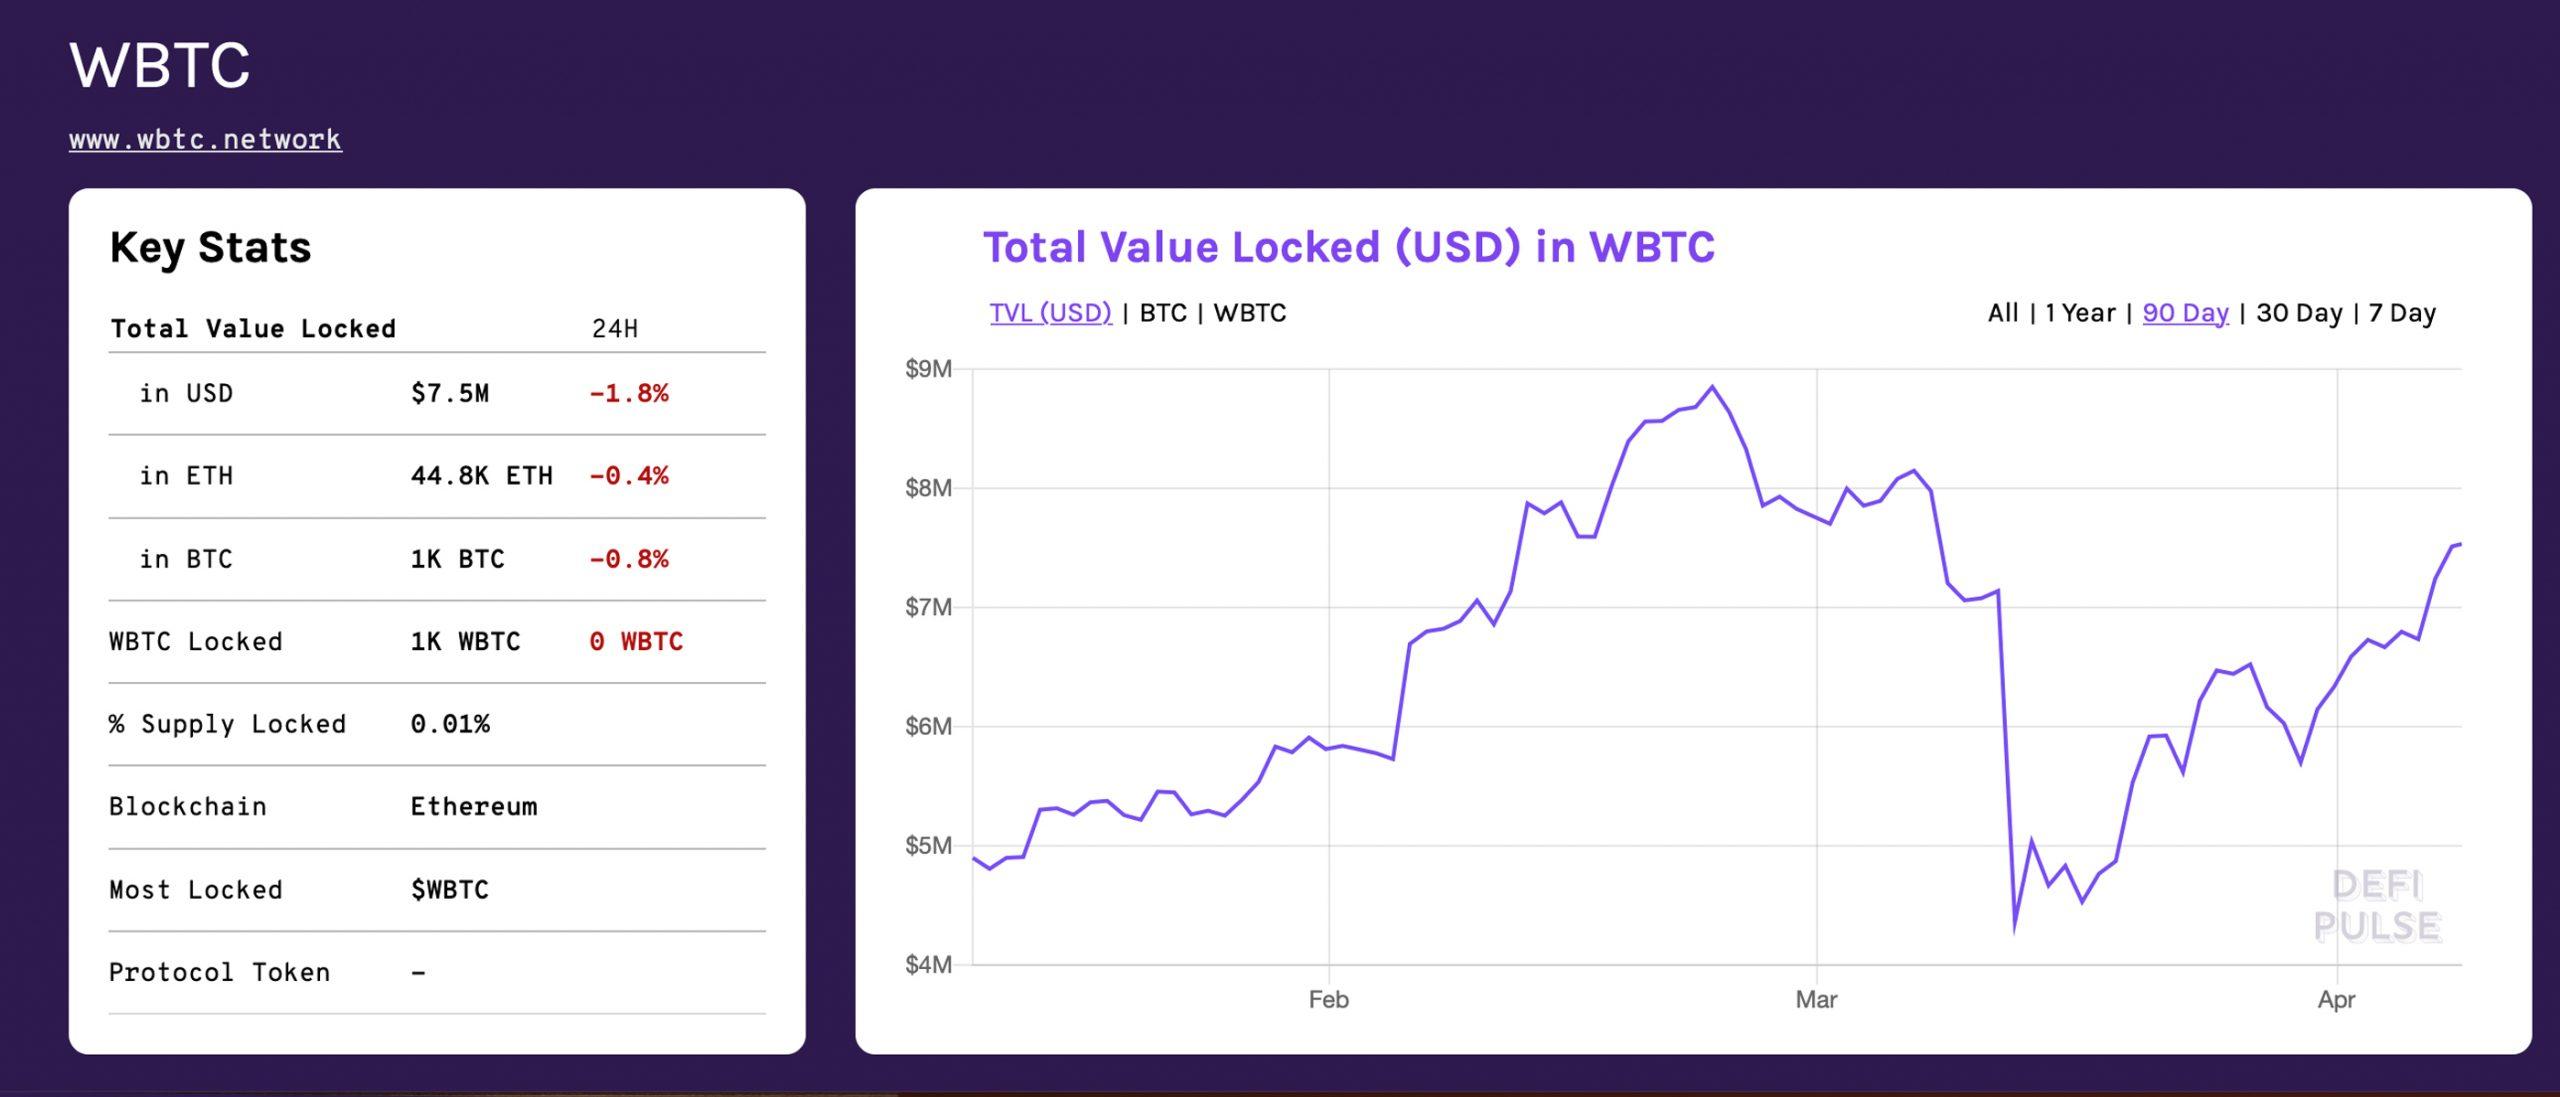 "La nueva plataforma de Bitcoin envuelta le permite realizar transacciones en BTC usando Tezos ""width ="" 2560 "" height = ""1097"" srcset = ""https://blackswanfinances.com/wp-content/uploads/2020/04/kloppwbtc-scaled.jpg 2560w, https://news.bitcoin.com/wp-content/uploads /2020/04/kloppwbtc-300x129.jpg 300w, https://news.bitcoin.com/wp-content/uploads/2020/04/kloppwbtc-1024x439.jpg 1024w, https://news.bitcoin.com/wp -content / uploads / 2020/04 / kloppwbtc-768x329.jpg 768w, https://news.bitcoin.com/wp-content/uploads/2020/04/kloppwbtc-1536x658.jpg 1536w, https: //news.bitcoin .com / wp-content / uploads / 2020/04 / kloppwbtc-2048x878.jpg 2048w, https://news.bitcoin.com/wp-content/uploads/2020/04/kloppwbtc-696x298.jpg 696w, https: / /news.bitcoin.com/wp-content/uploads/2020/04/kloppwbtc-1392x597.jpg 1392w, https://news.bitcoin.com/wp-content/uploads/2020/04/kloppwbtc-1068x458.jpg 1068w , https : //news.bitcoin.com/wp-content/uploads/2020/04/kloppwbtc-980x420.jpg 980w, https://news.bitcoin.com/wp-content/uploads/2020/04/kloppwbtc-1920x823. jpg 1920w ""tamaños ="" (ancho máximo: 2560px) 100vw, 2560px"